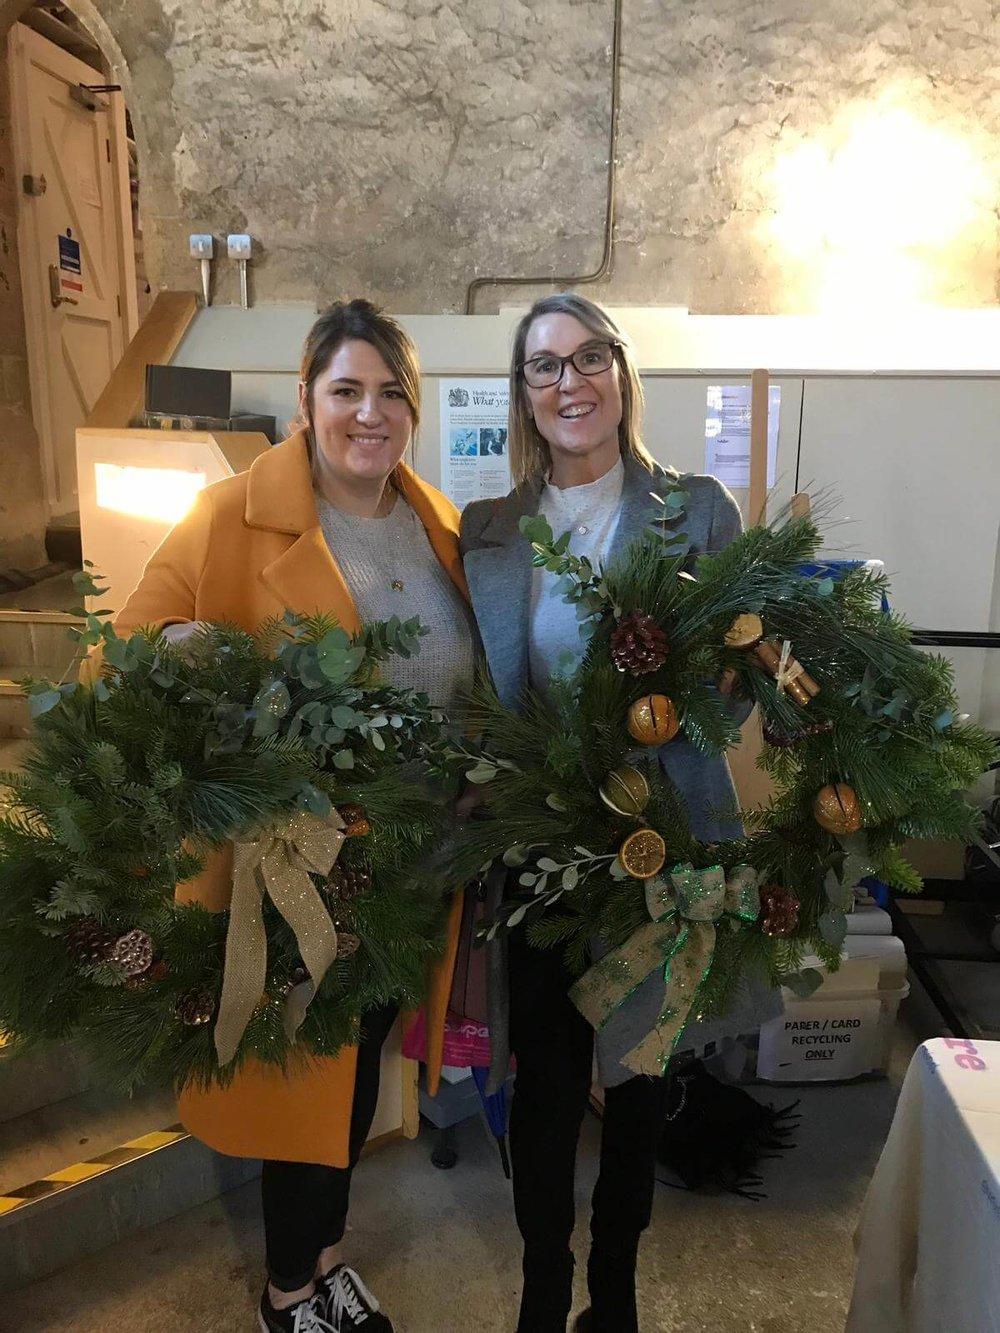 Christmas Wreath Making Workshop Ely Cambridgeshire 2nd December (7).jpg